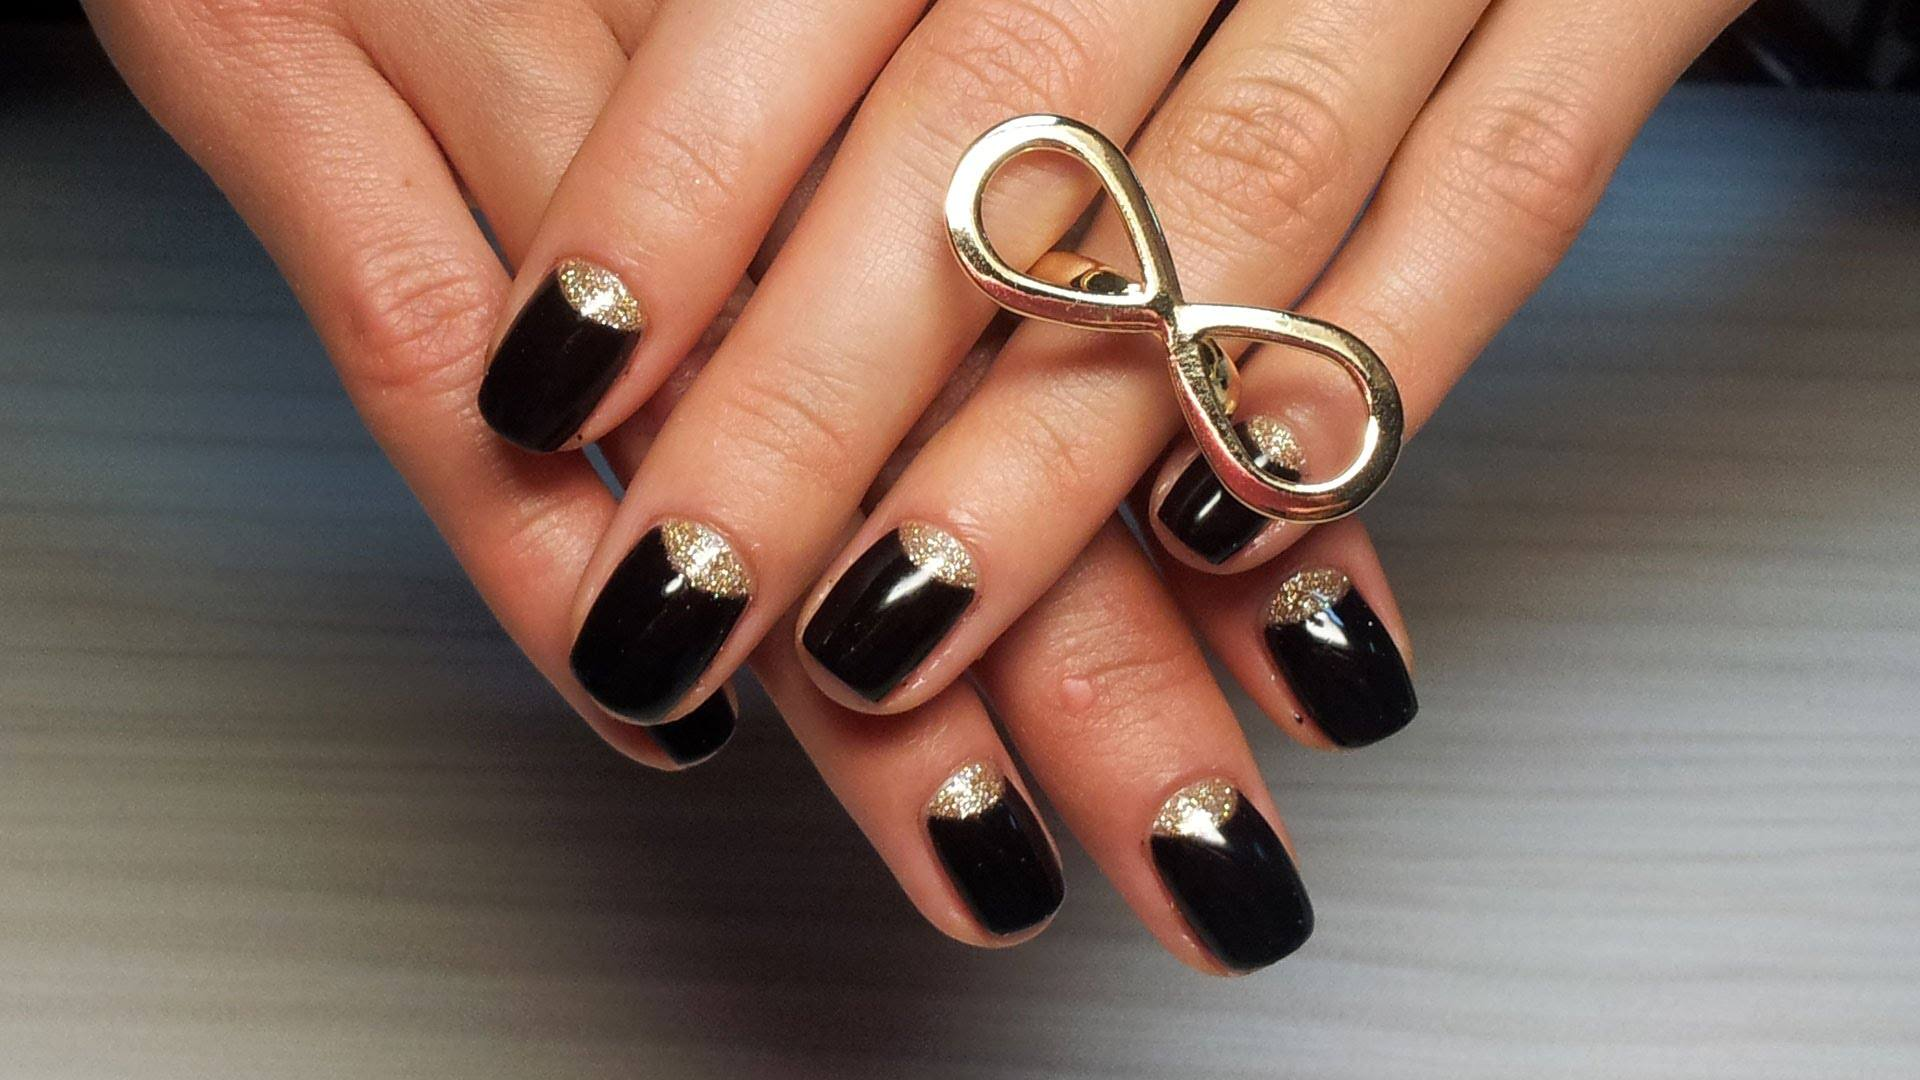 Узкие ногти на руках фото